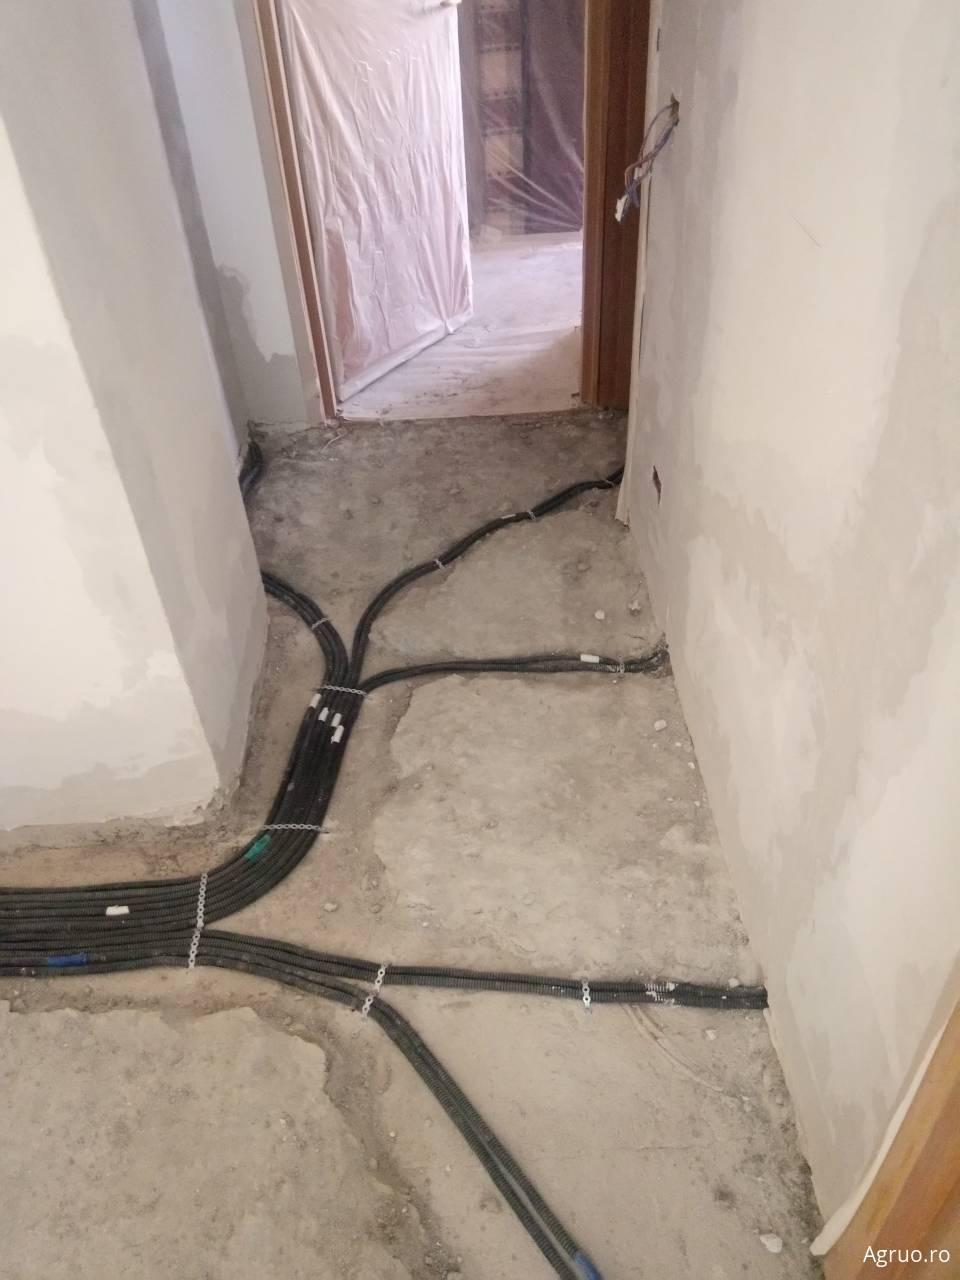 Manopera instalatie electrica pentru un apartament 2 camere1435